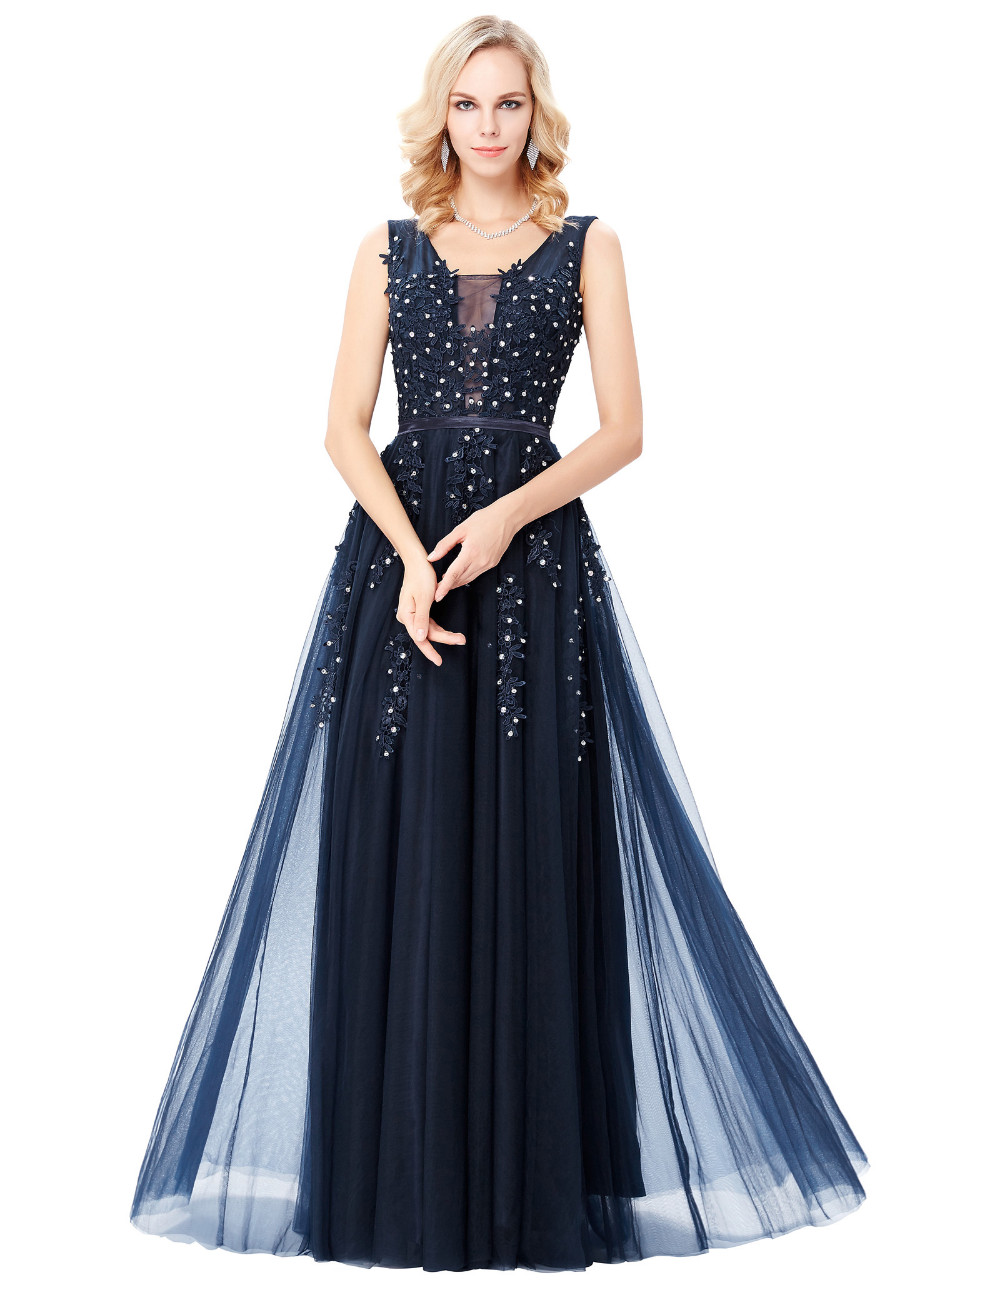 Grace Karin Tulle Appliques Celebrity Prom Dress Sexy V Back Sleeveless Long Royal Blue Robes De Soiree 2017 Longue Prom Dresses 10